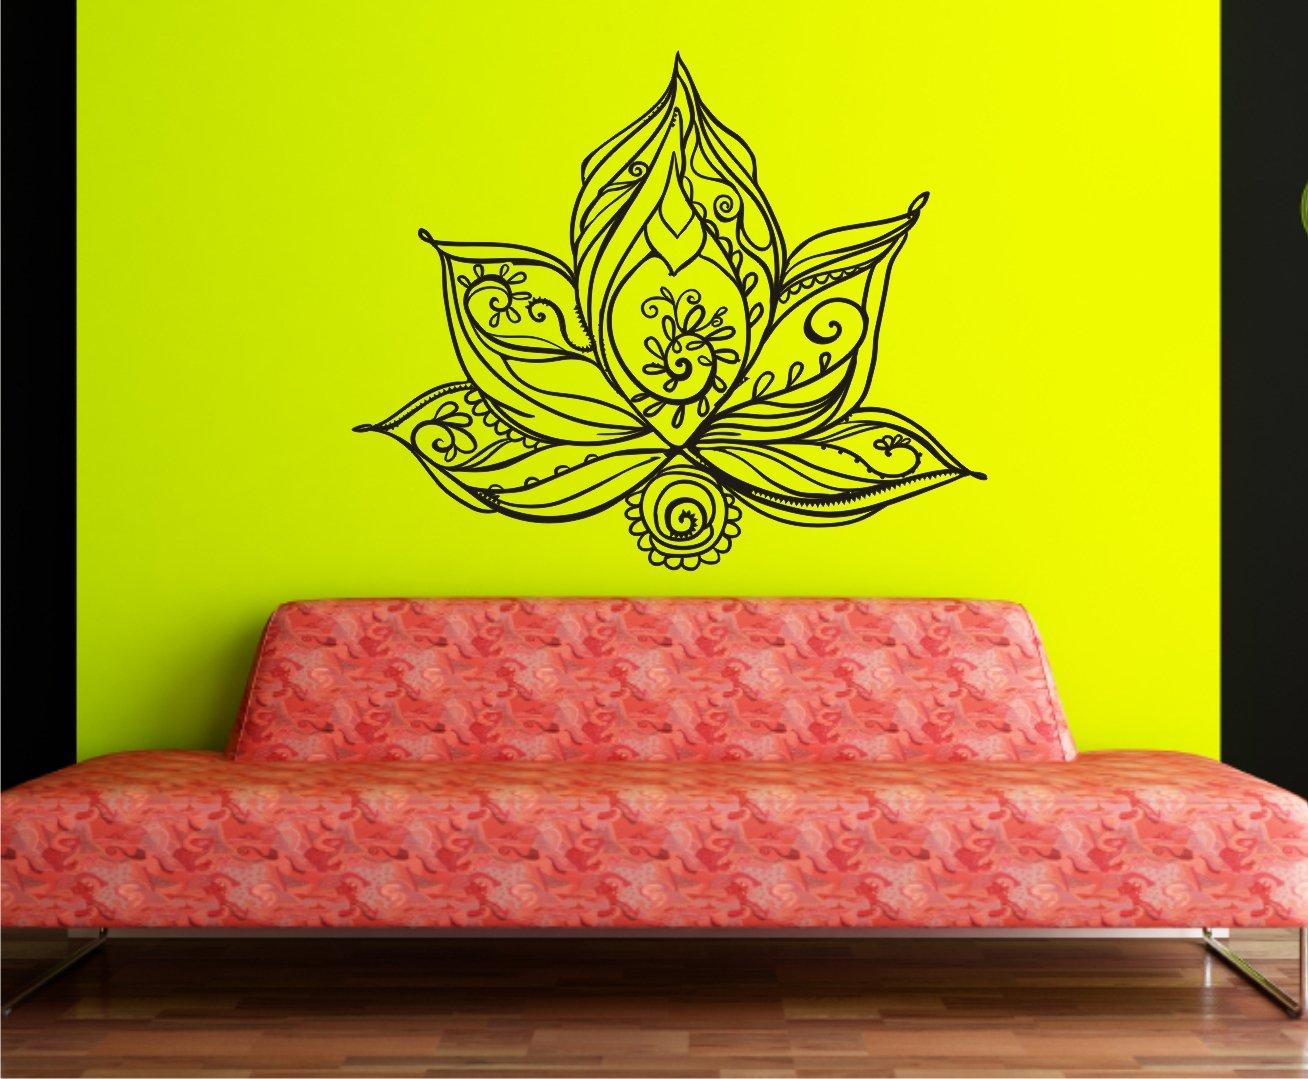 WERBUNGkreativ Wandtattoo Wandtattoo Wandtattoo LotusBlaume Lotus in 33 Farben matt oder glänzend Aufkleber Mandala Yoga OrnamentBlaume Wandaufkleber 60x70cm B01MSDKHPB Wandtattoos & Wandbilder f615a7